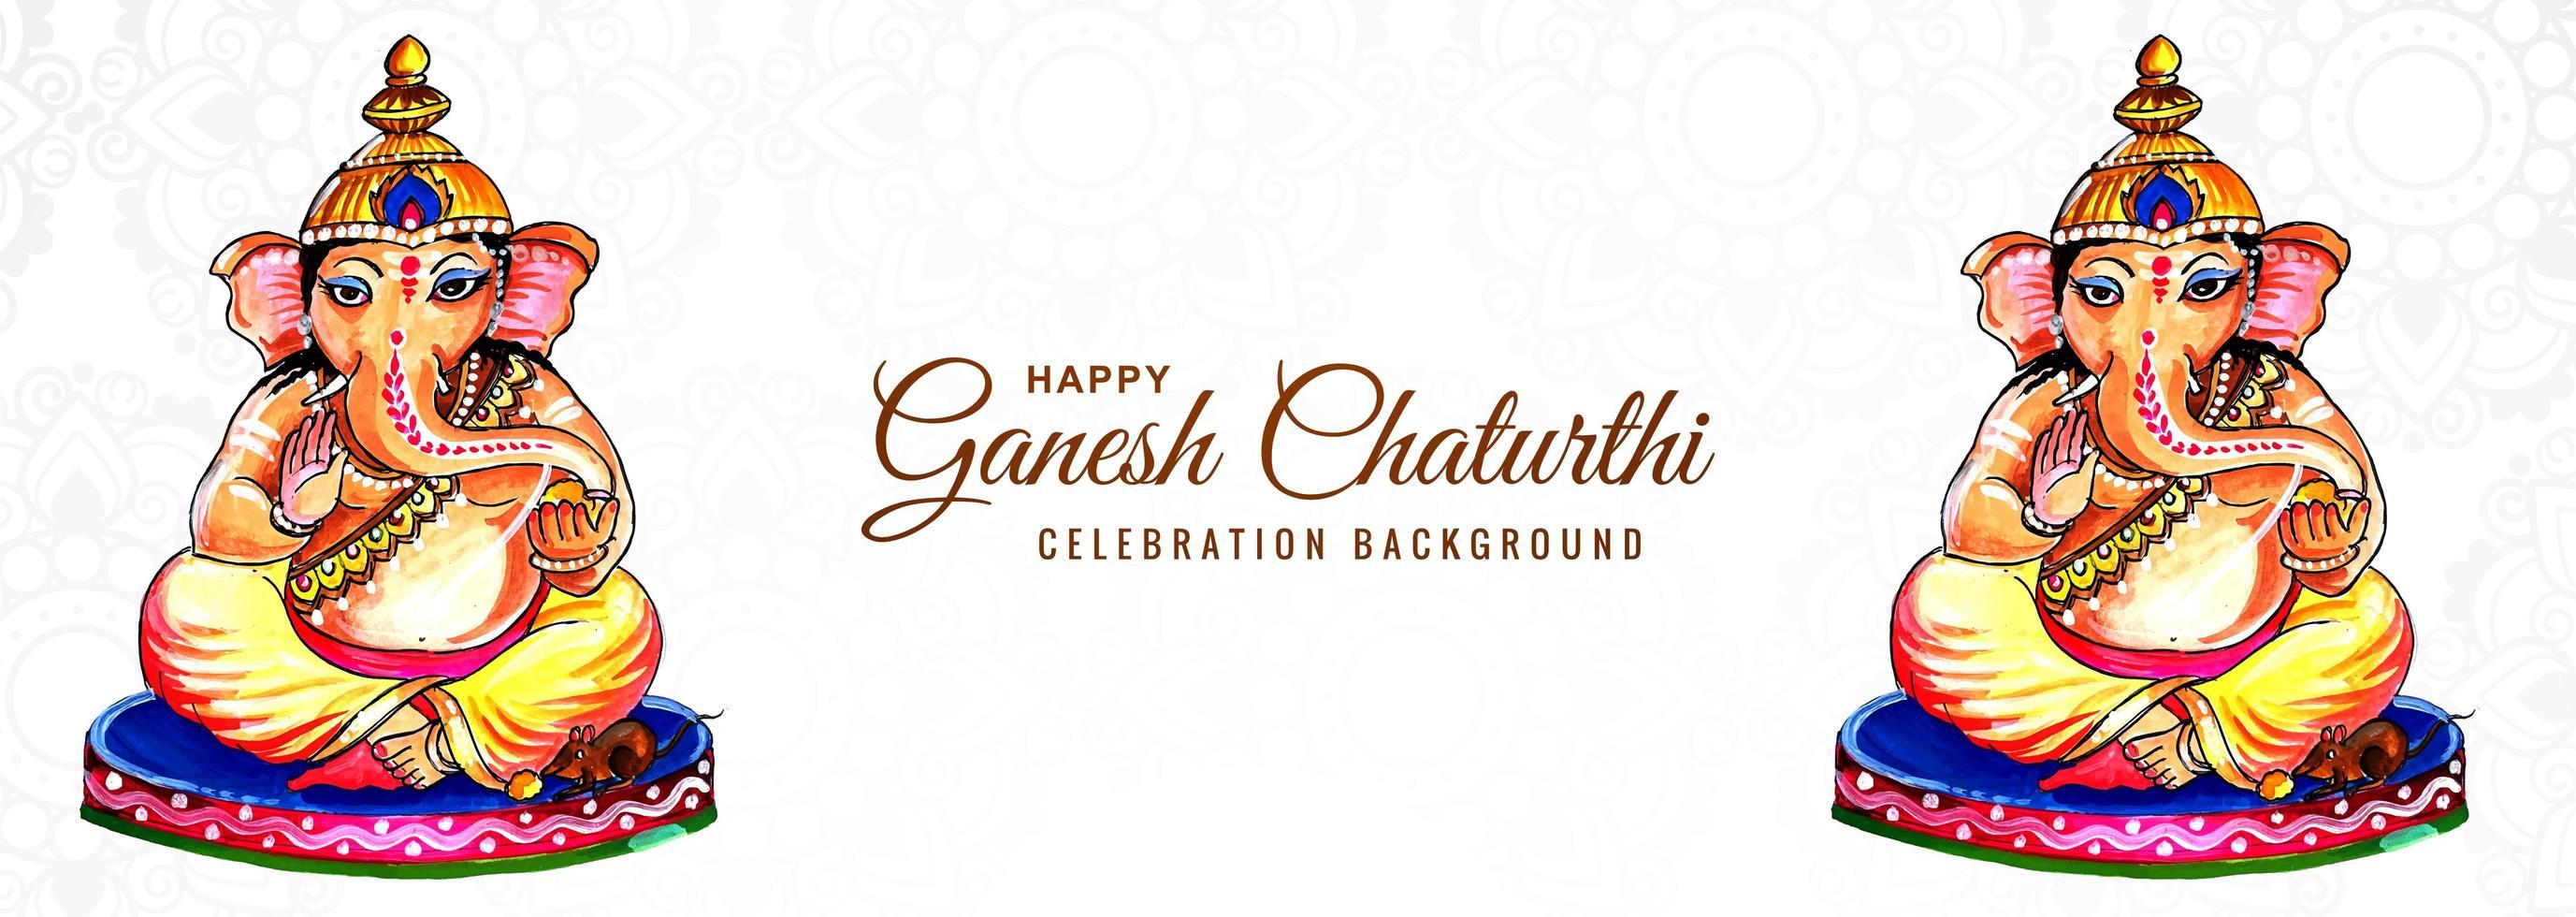 banner do festival religioso indiano ganesh chaturthi vetor